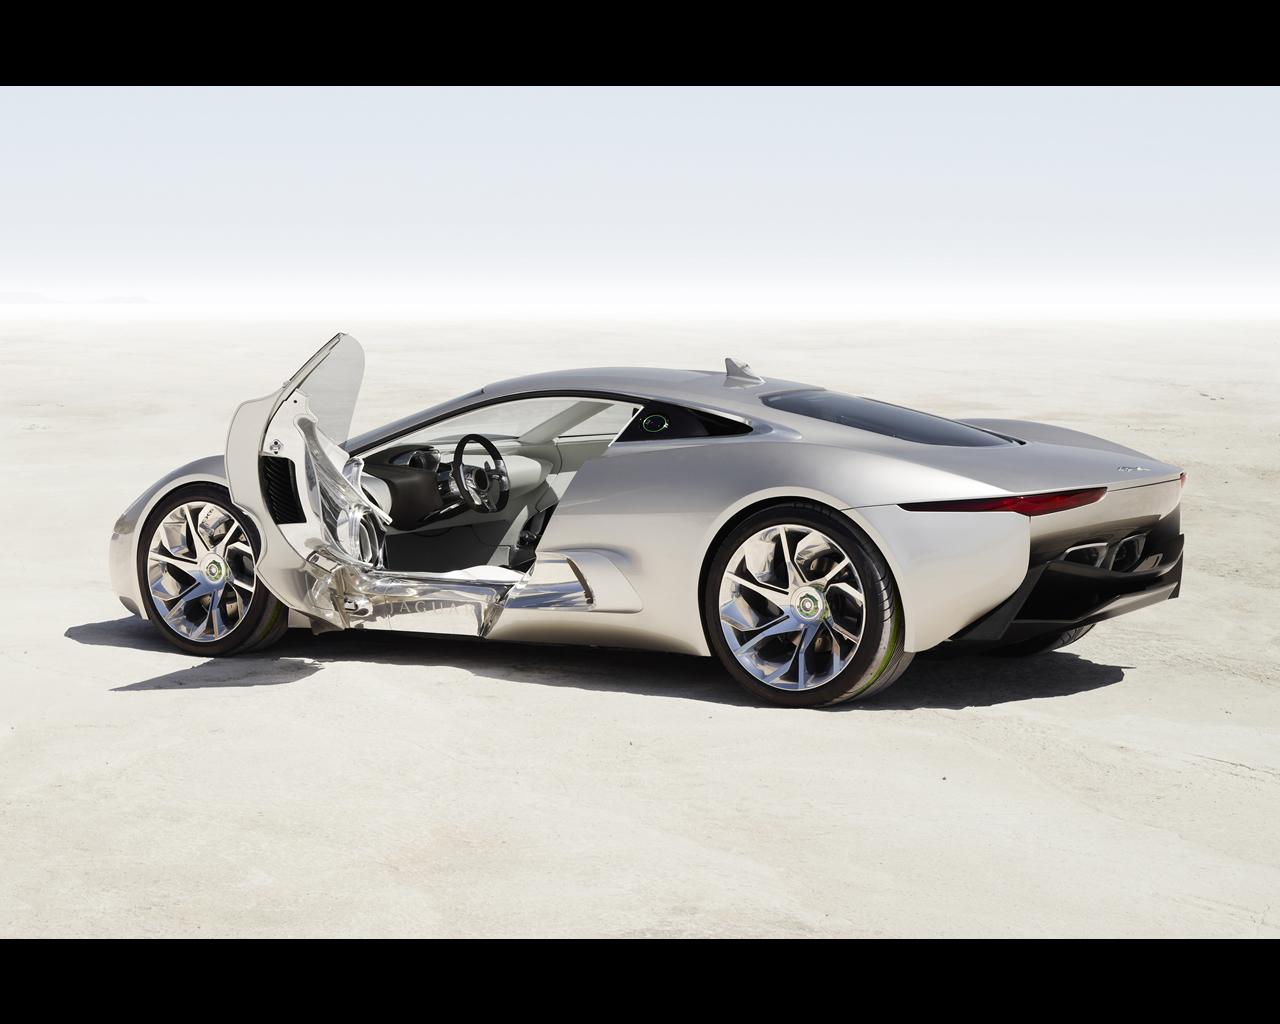 Merveilleux Jaguar C X75 Concept 2010   Plug In Electric Car With Gas Turbines  Propelled Range Extender.